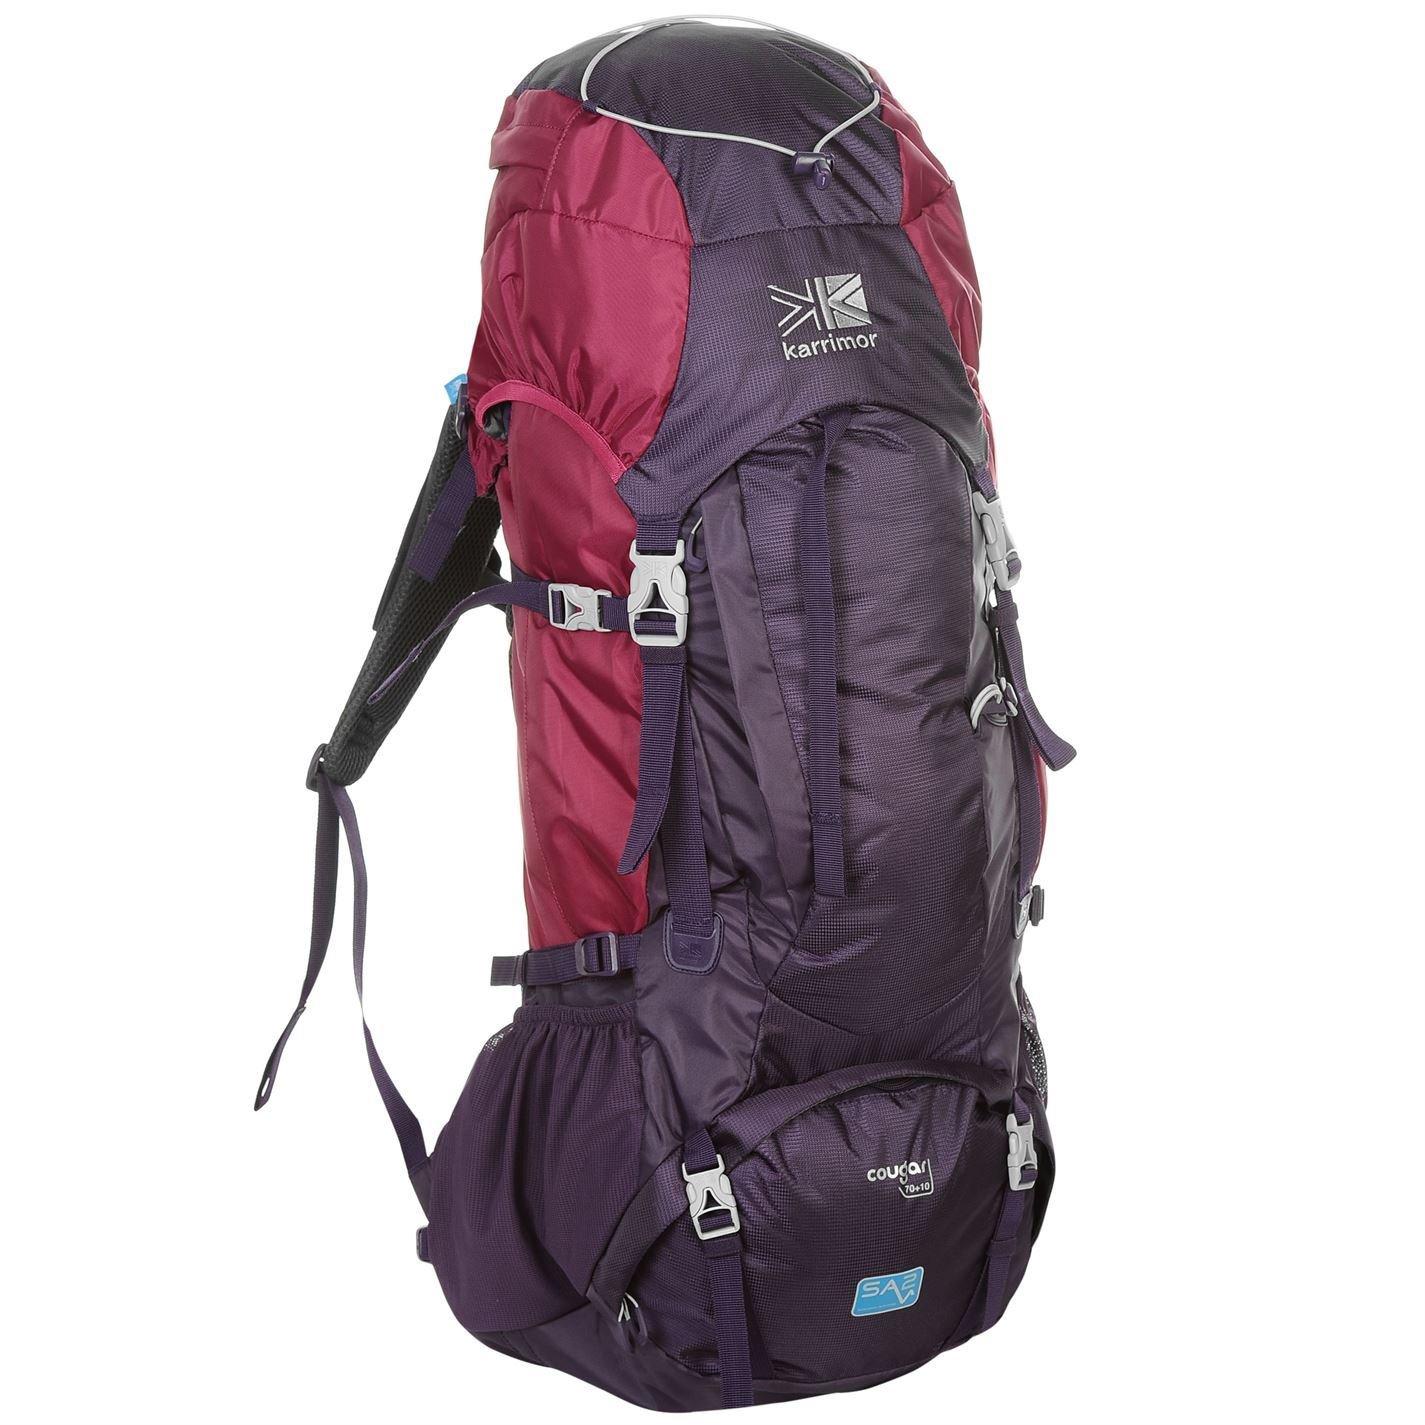 Karrimor Rucksacks 32L//65L//70L Backpack Daypack Bags Ridge Leopard Cougar Jaguar H:75 x W:30 x D:20 cm Cougar 70+10 Litre Purple